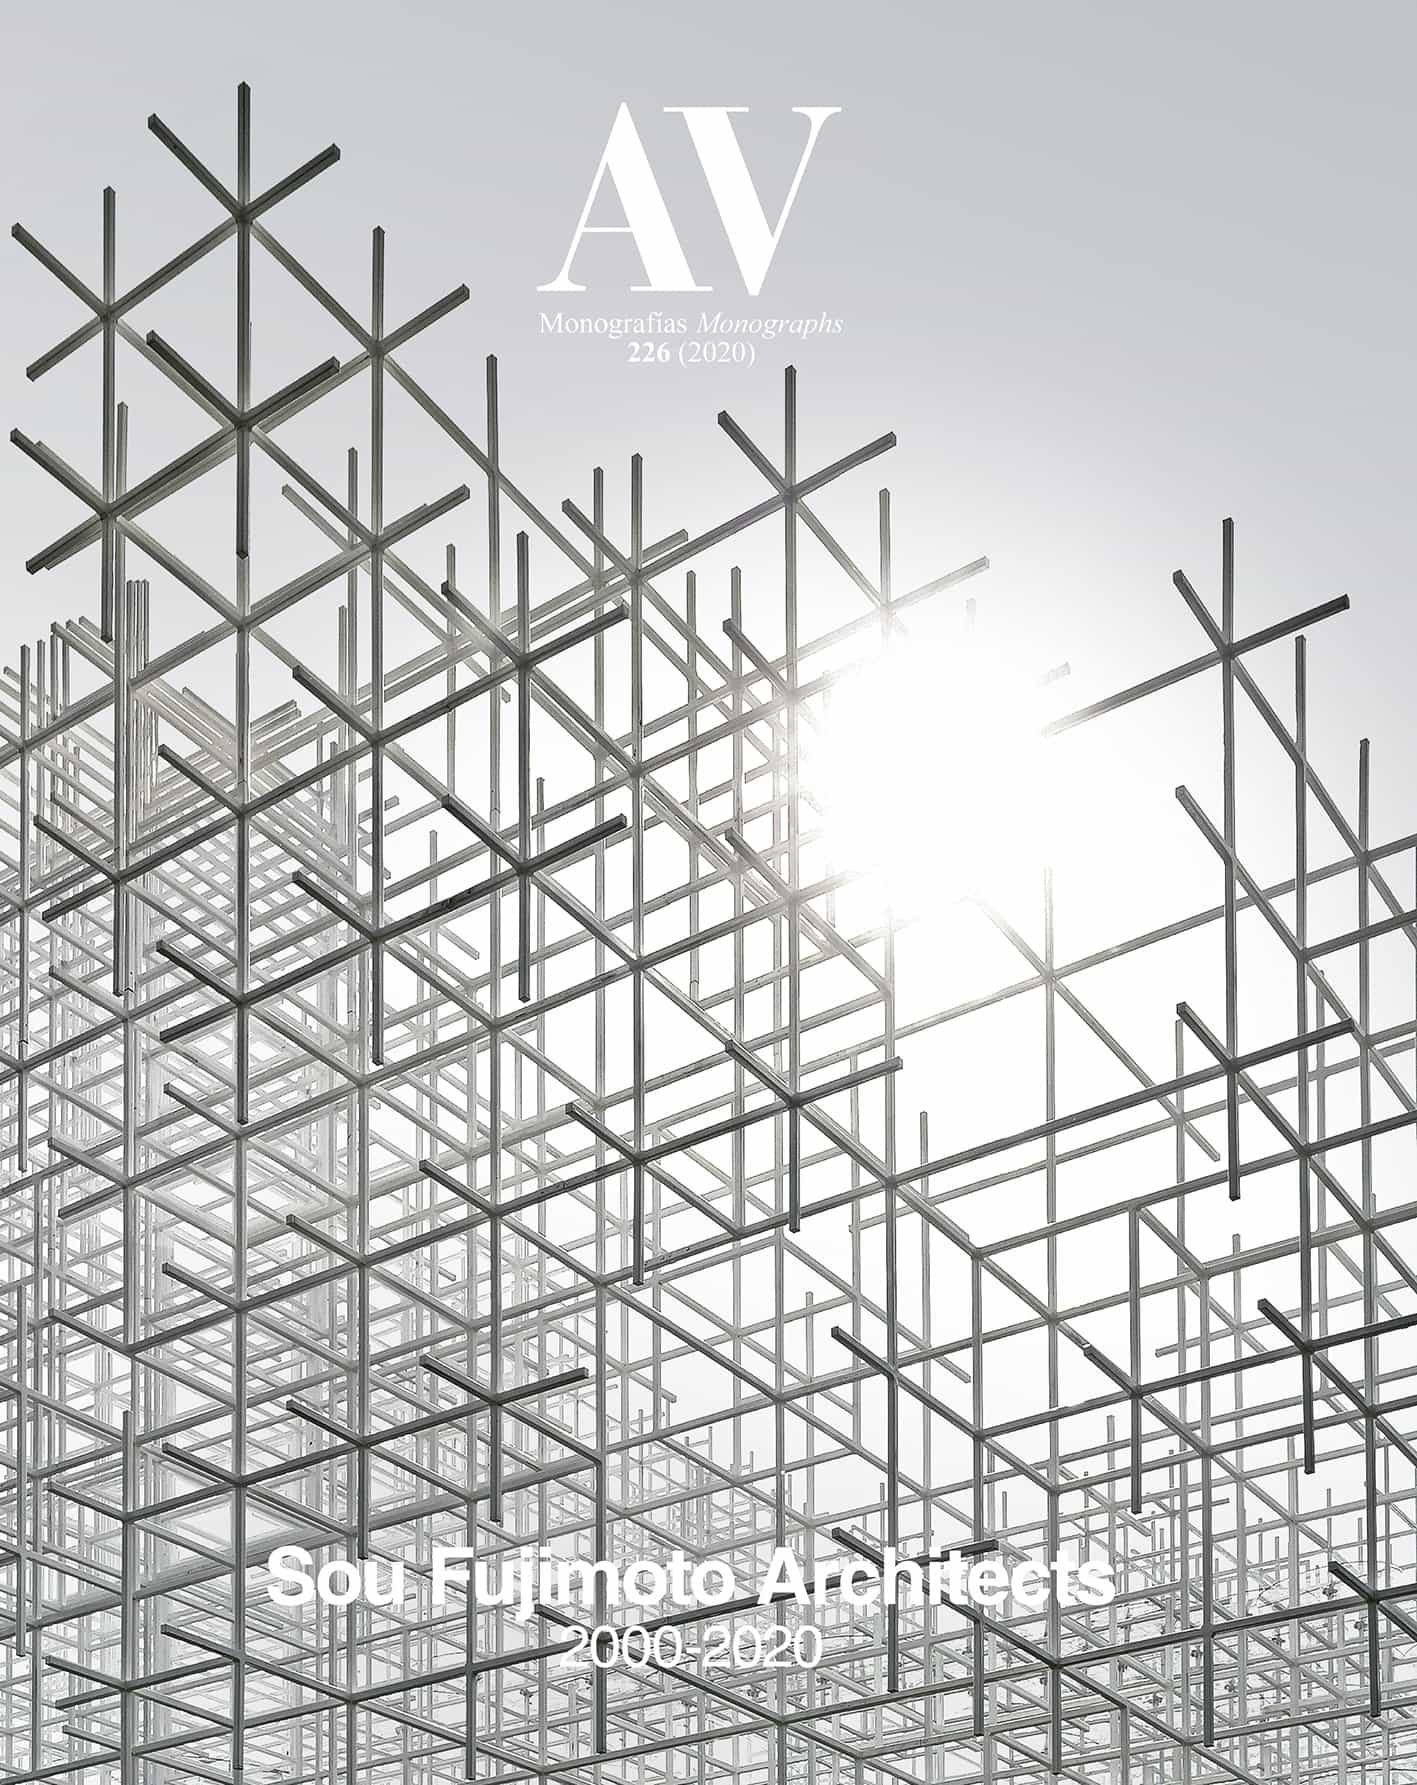 Av Monografias Nº 226. Sou Fujimoto Architects - Vv.aa.